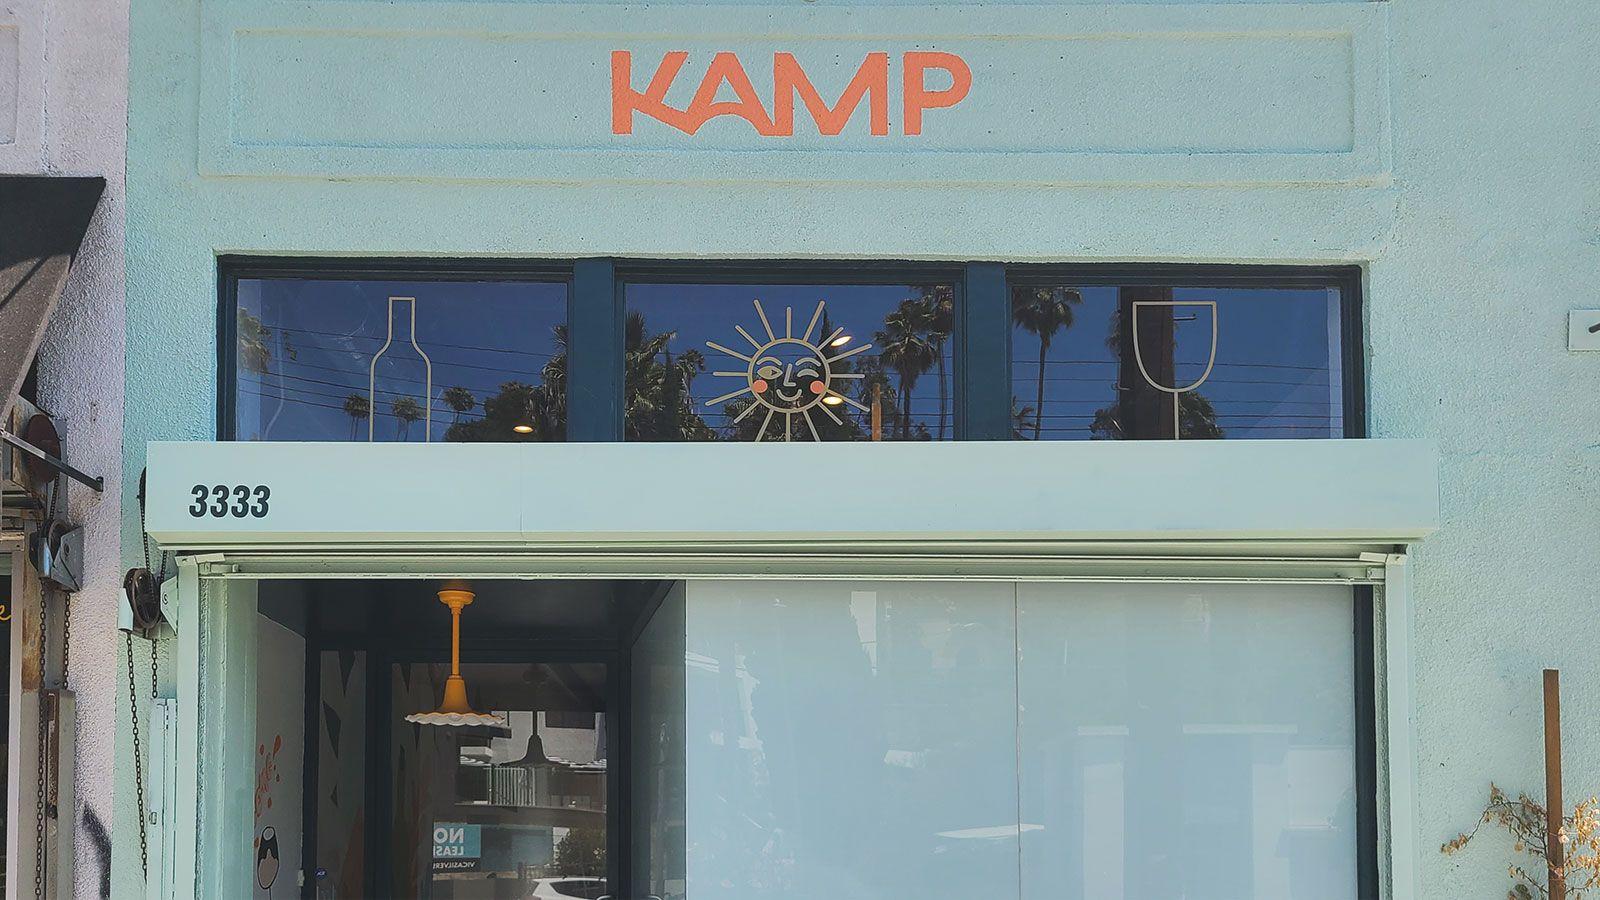 Summer Kamp storefront decals